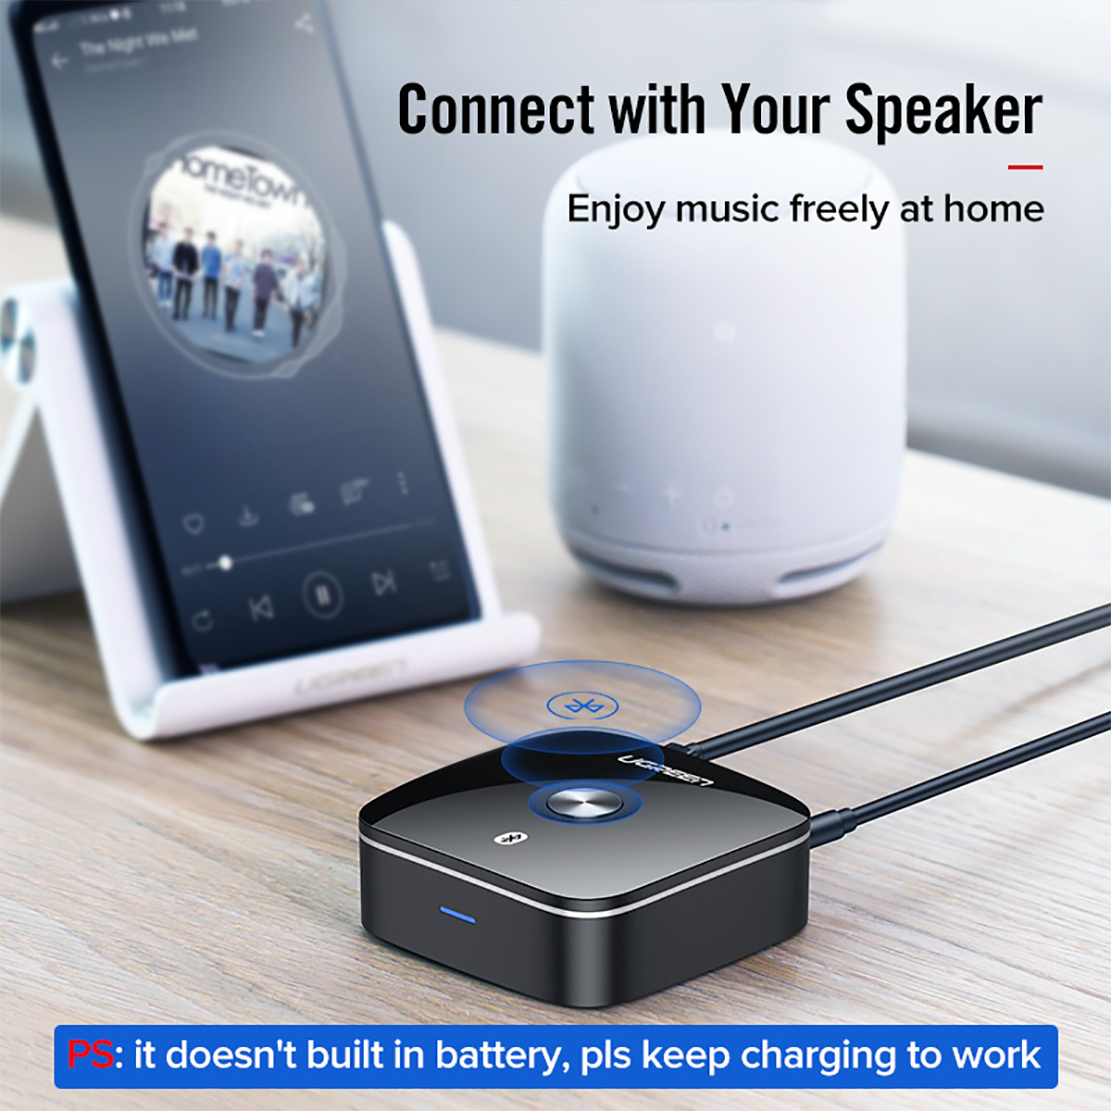 Thiết bị nhận Bluetooth Music Receiver 5.0 Ugreen 40759